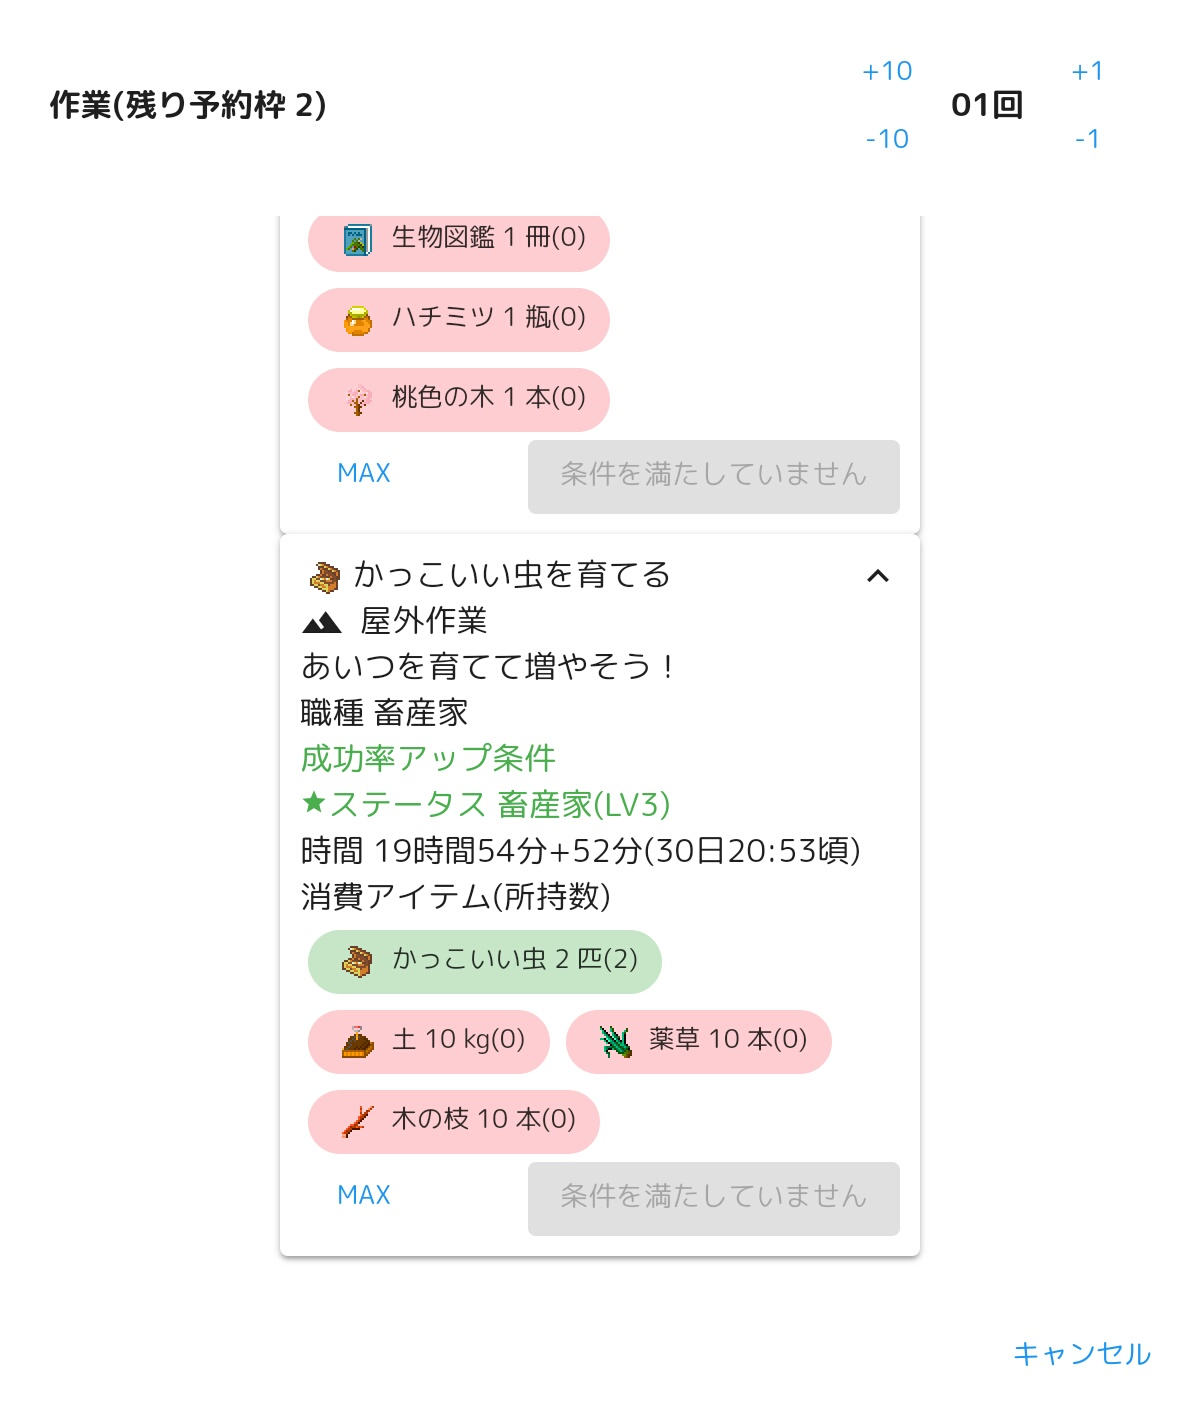 IMG_4tucol